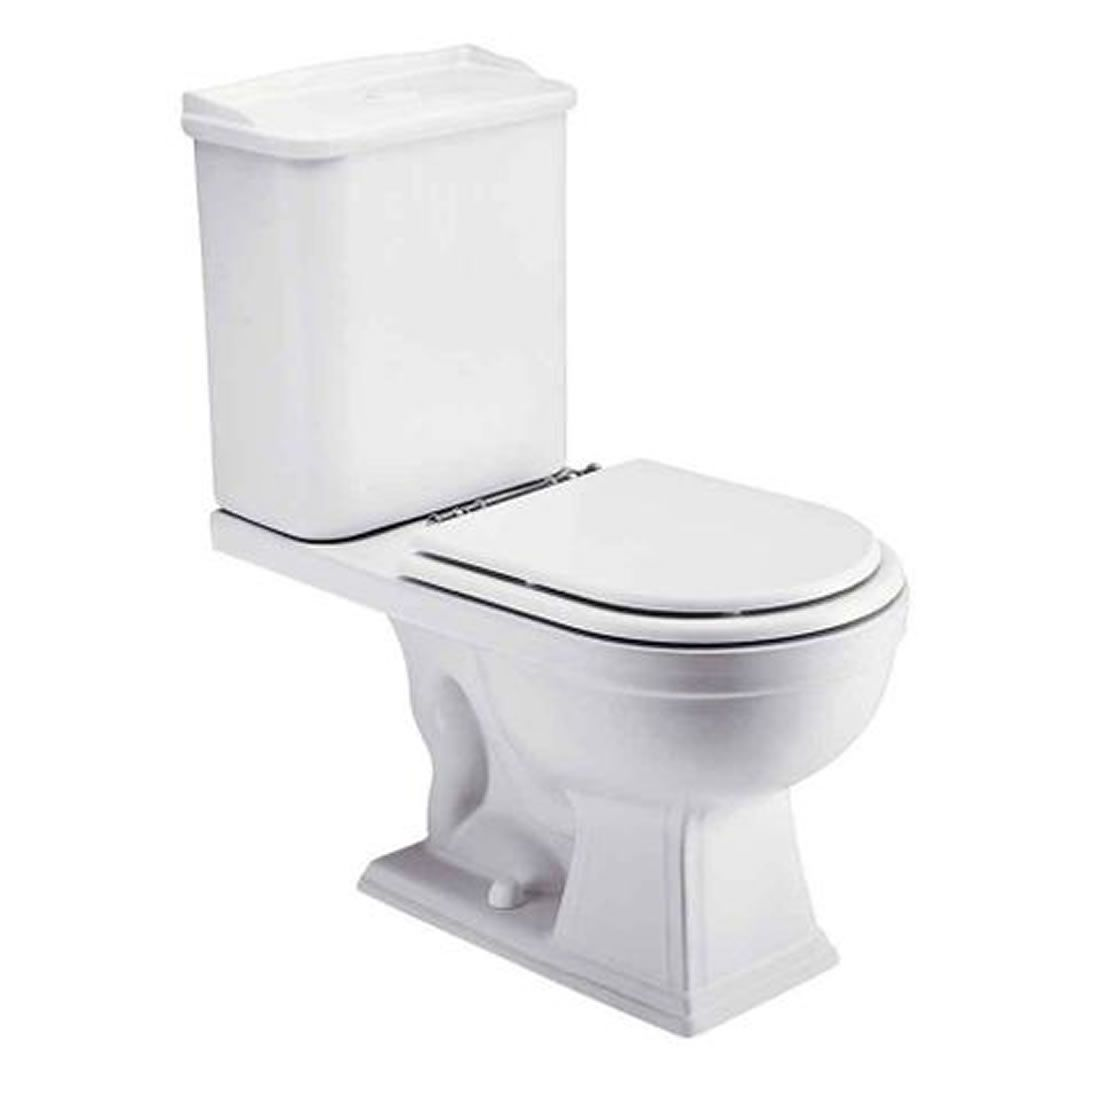 Kit Vaso Sanitário com Caixa Acoplada 3/6L Ecoflush Oxforde Branco Gelo Deca